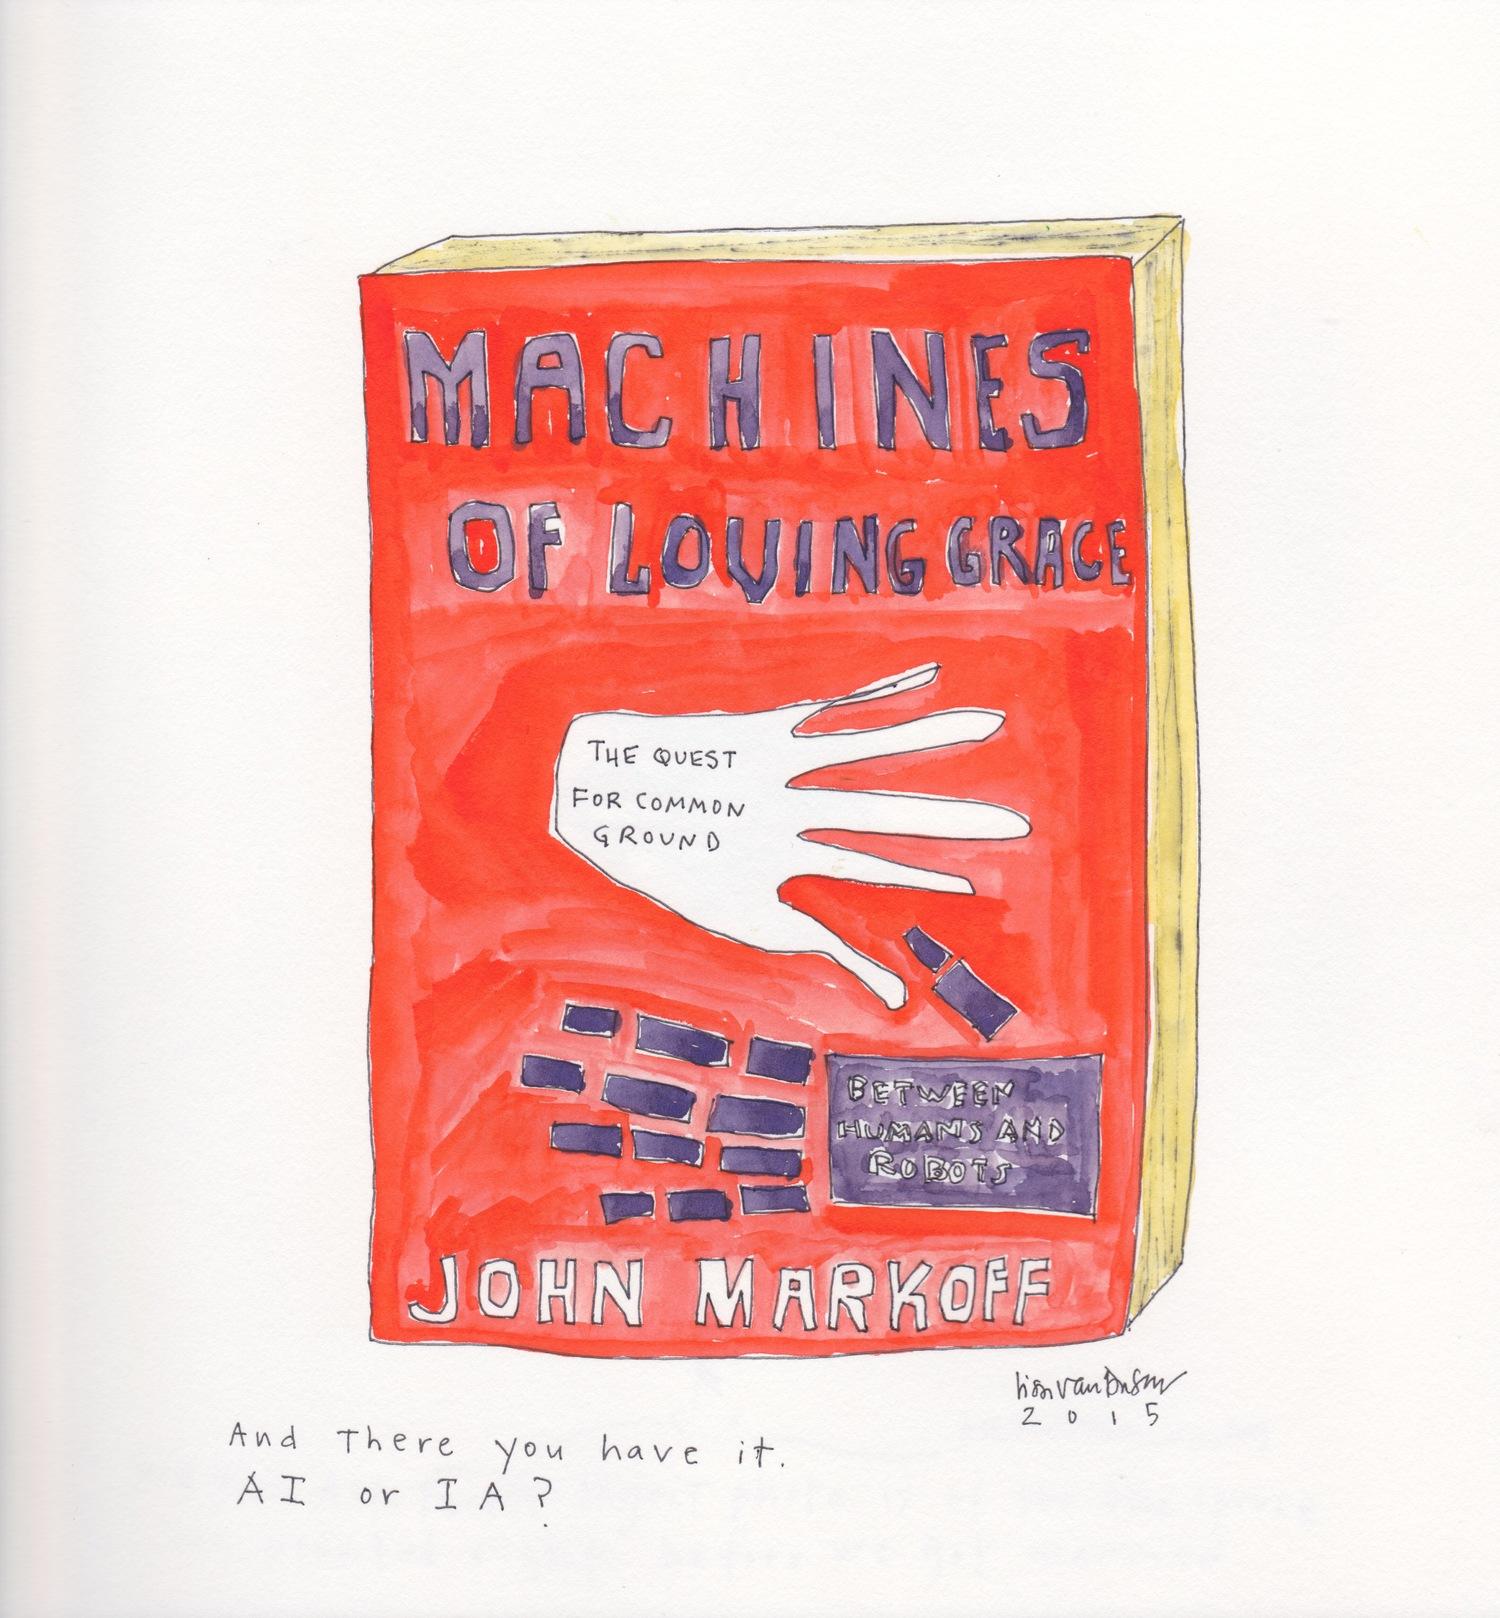 First+Person+John+Markoff+book+2015+JPEG+600+DPI.jpeg